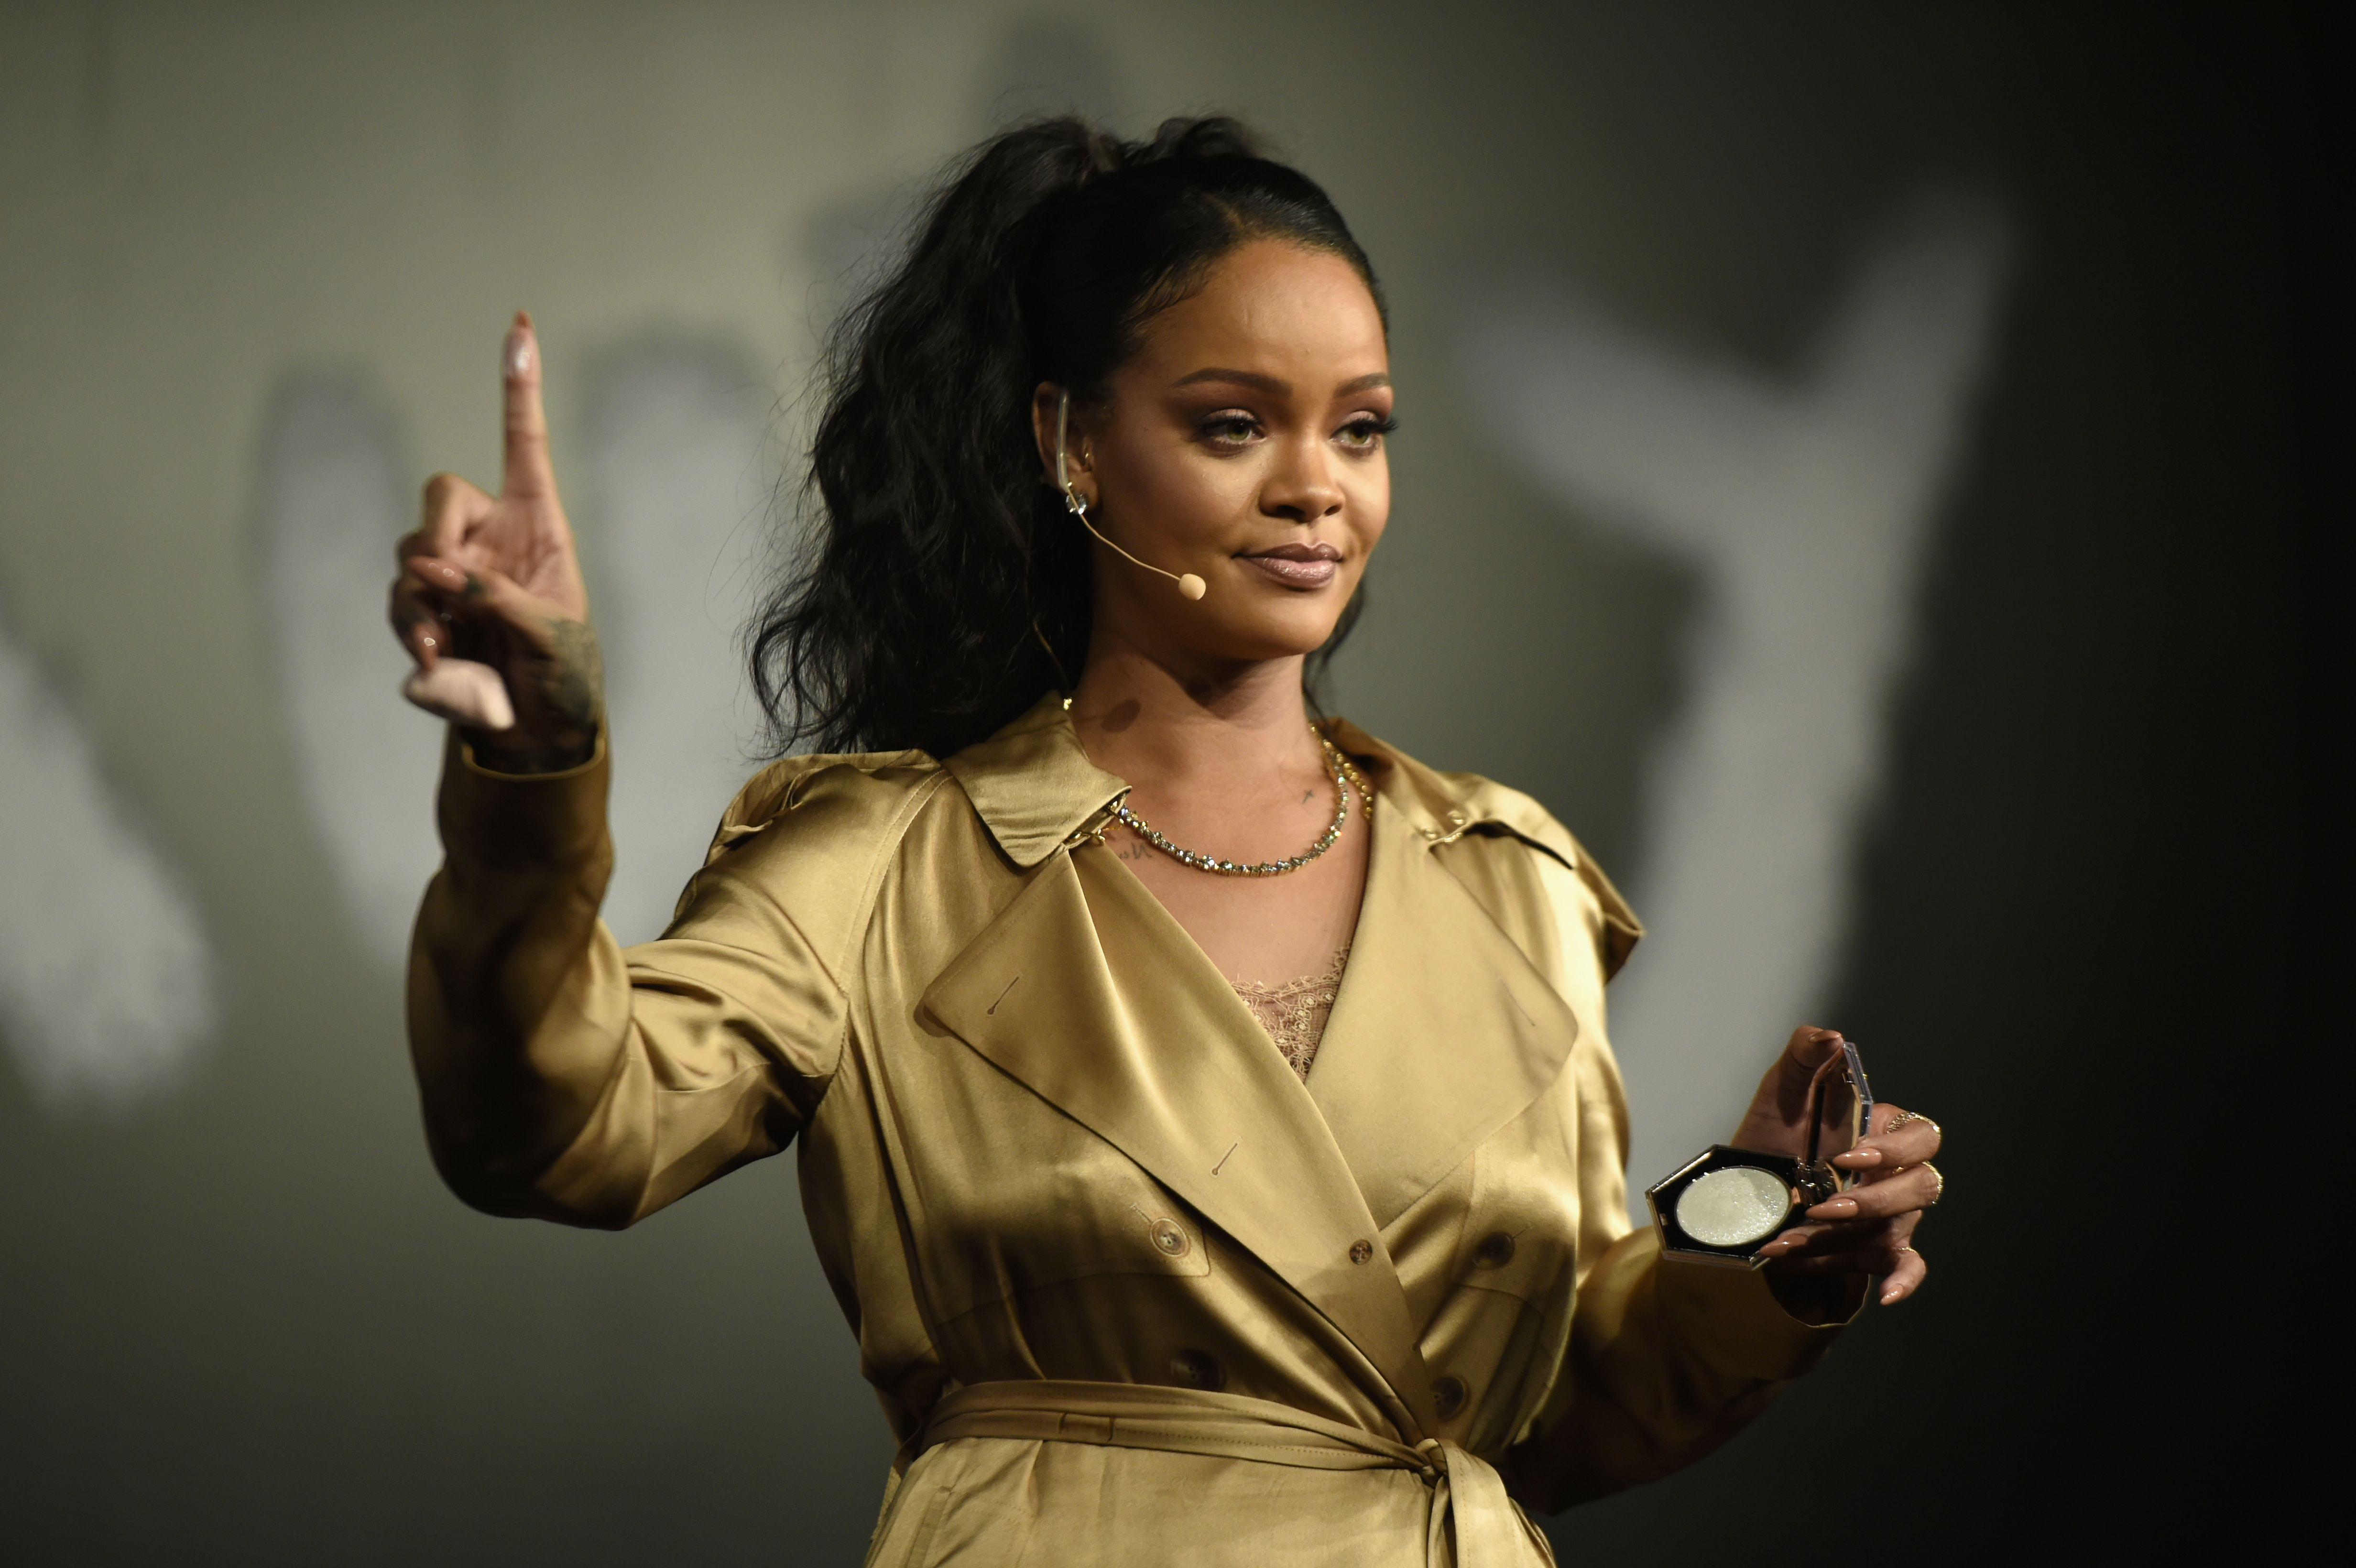 Why Rihanna decided to call her fashion brand Fenty